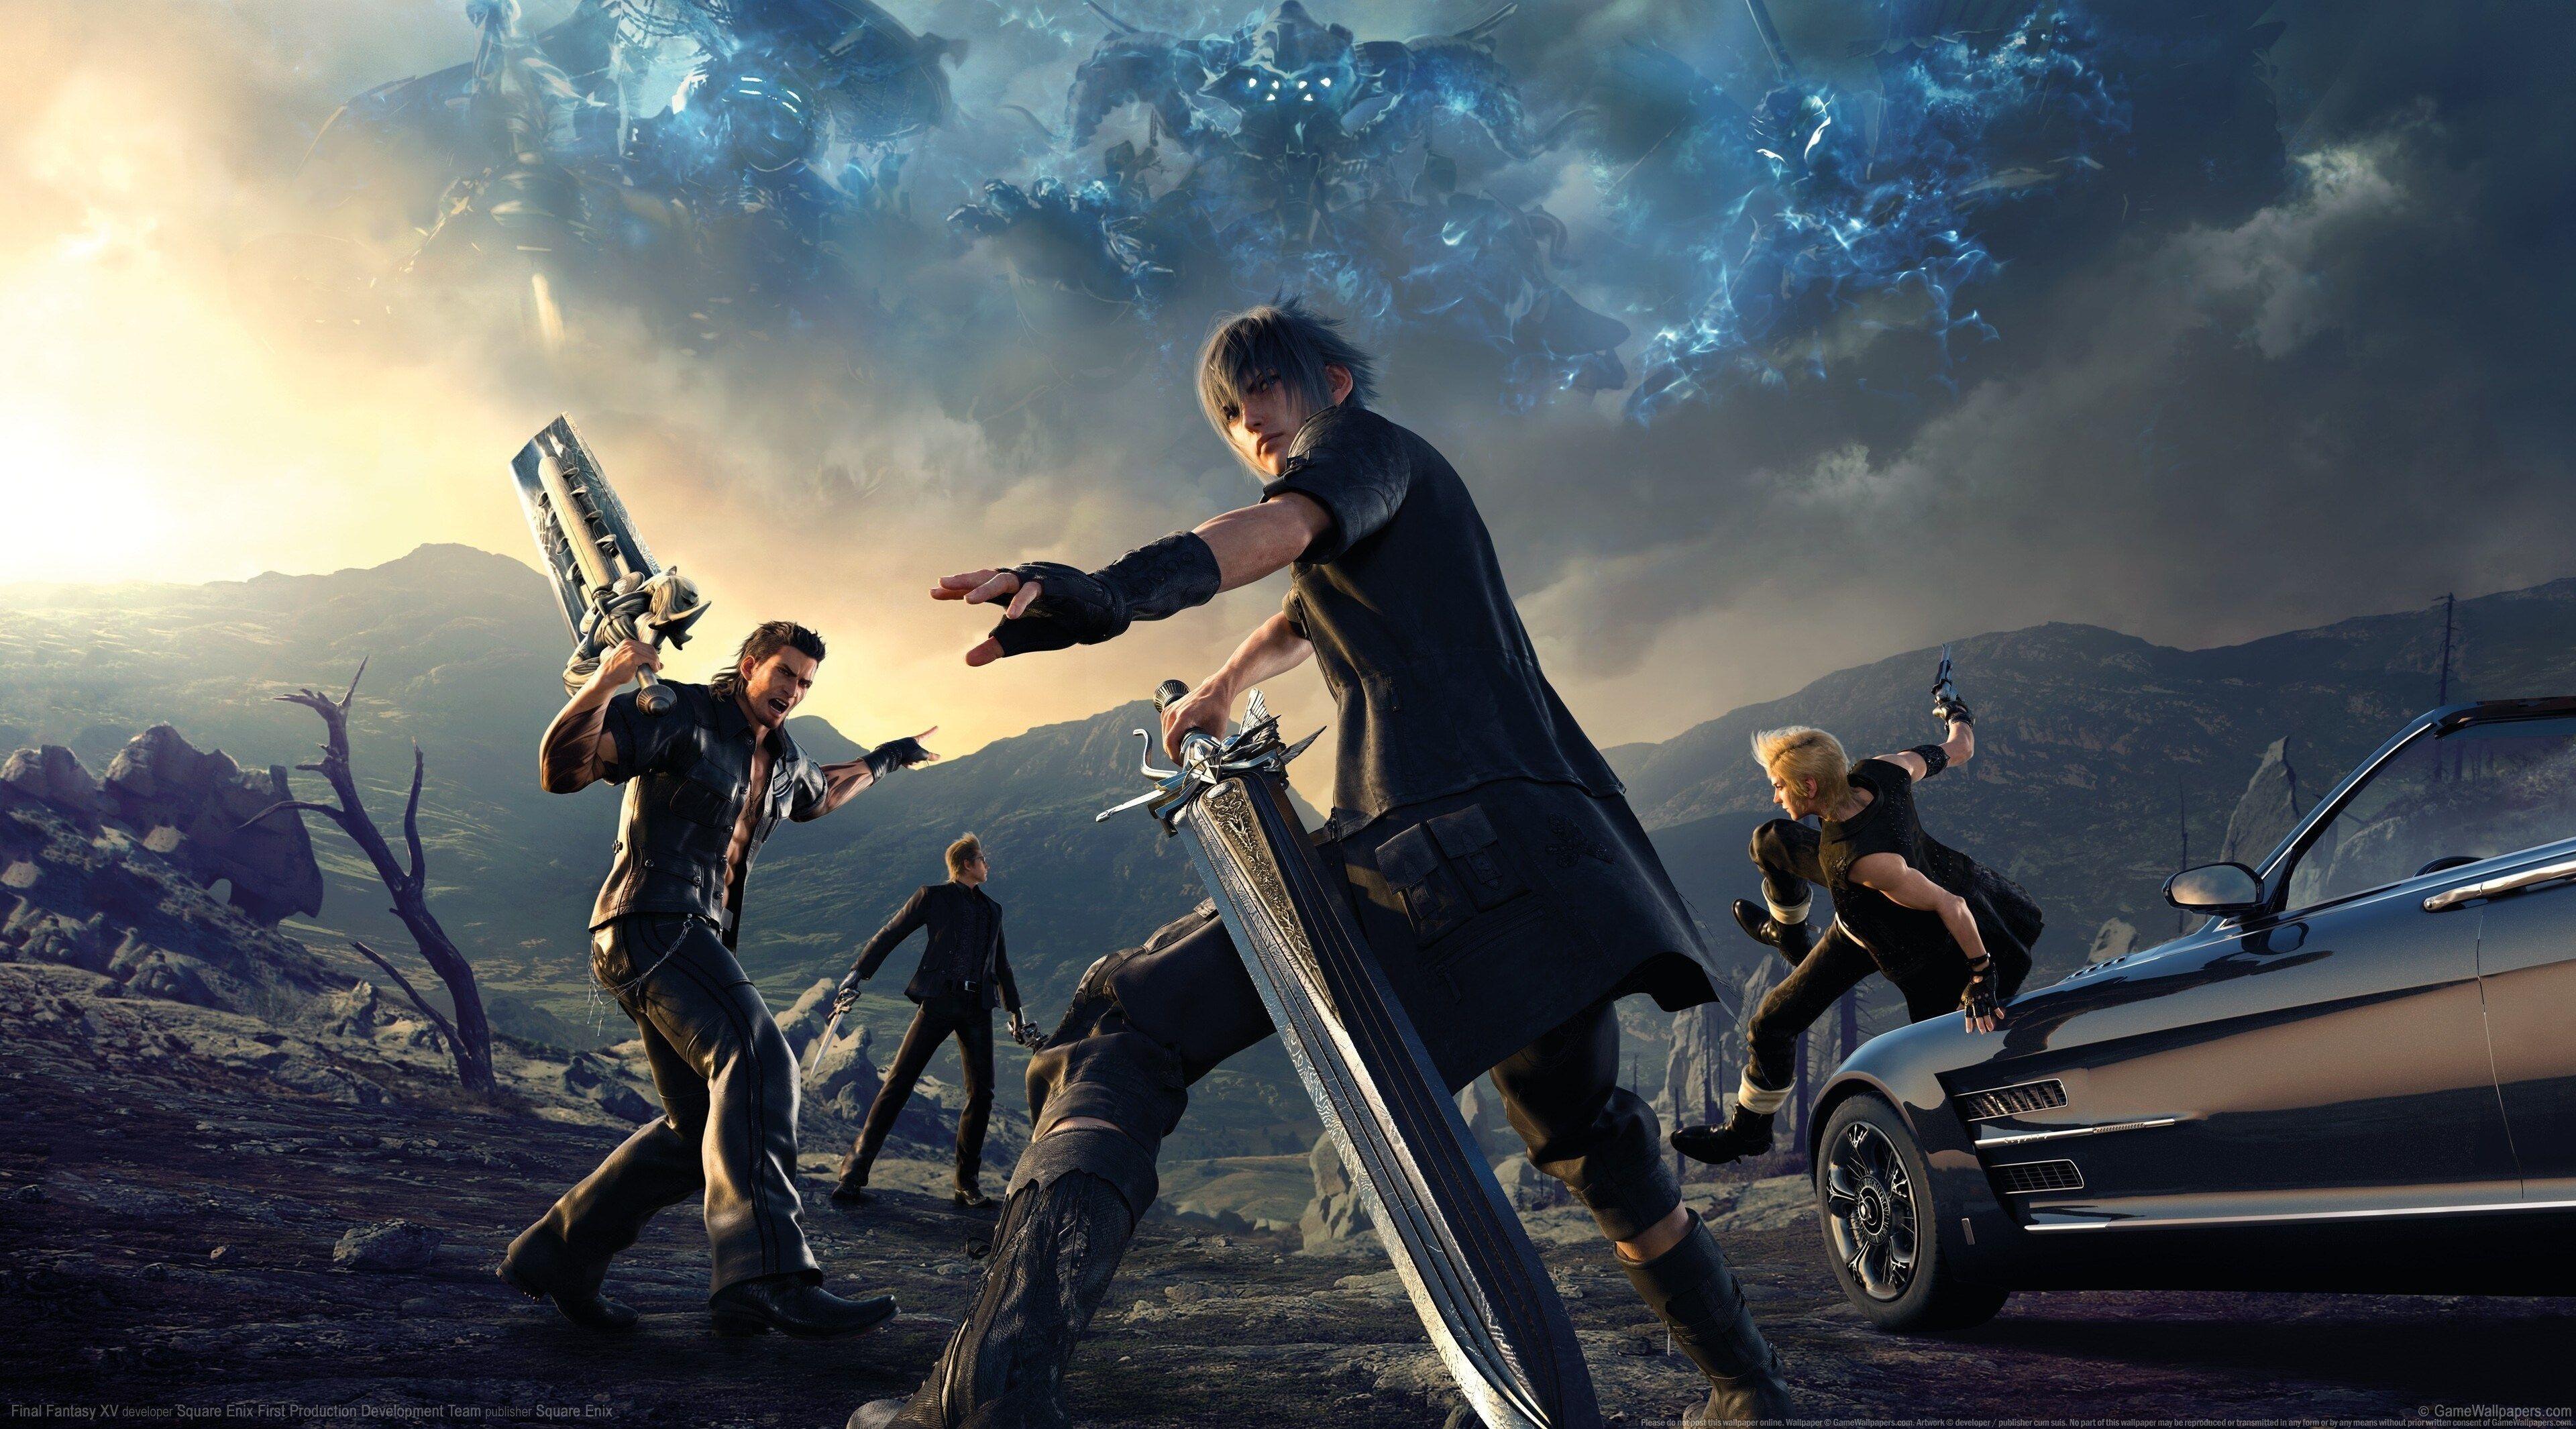 3840x2130 Final Fantasy 15 4k Wallpaper For Desktop Background Final Fantasy Final Fantasy Vii Final